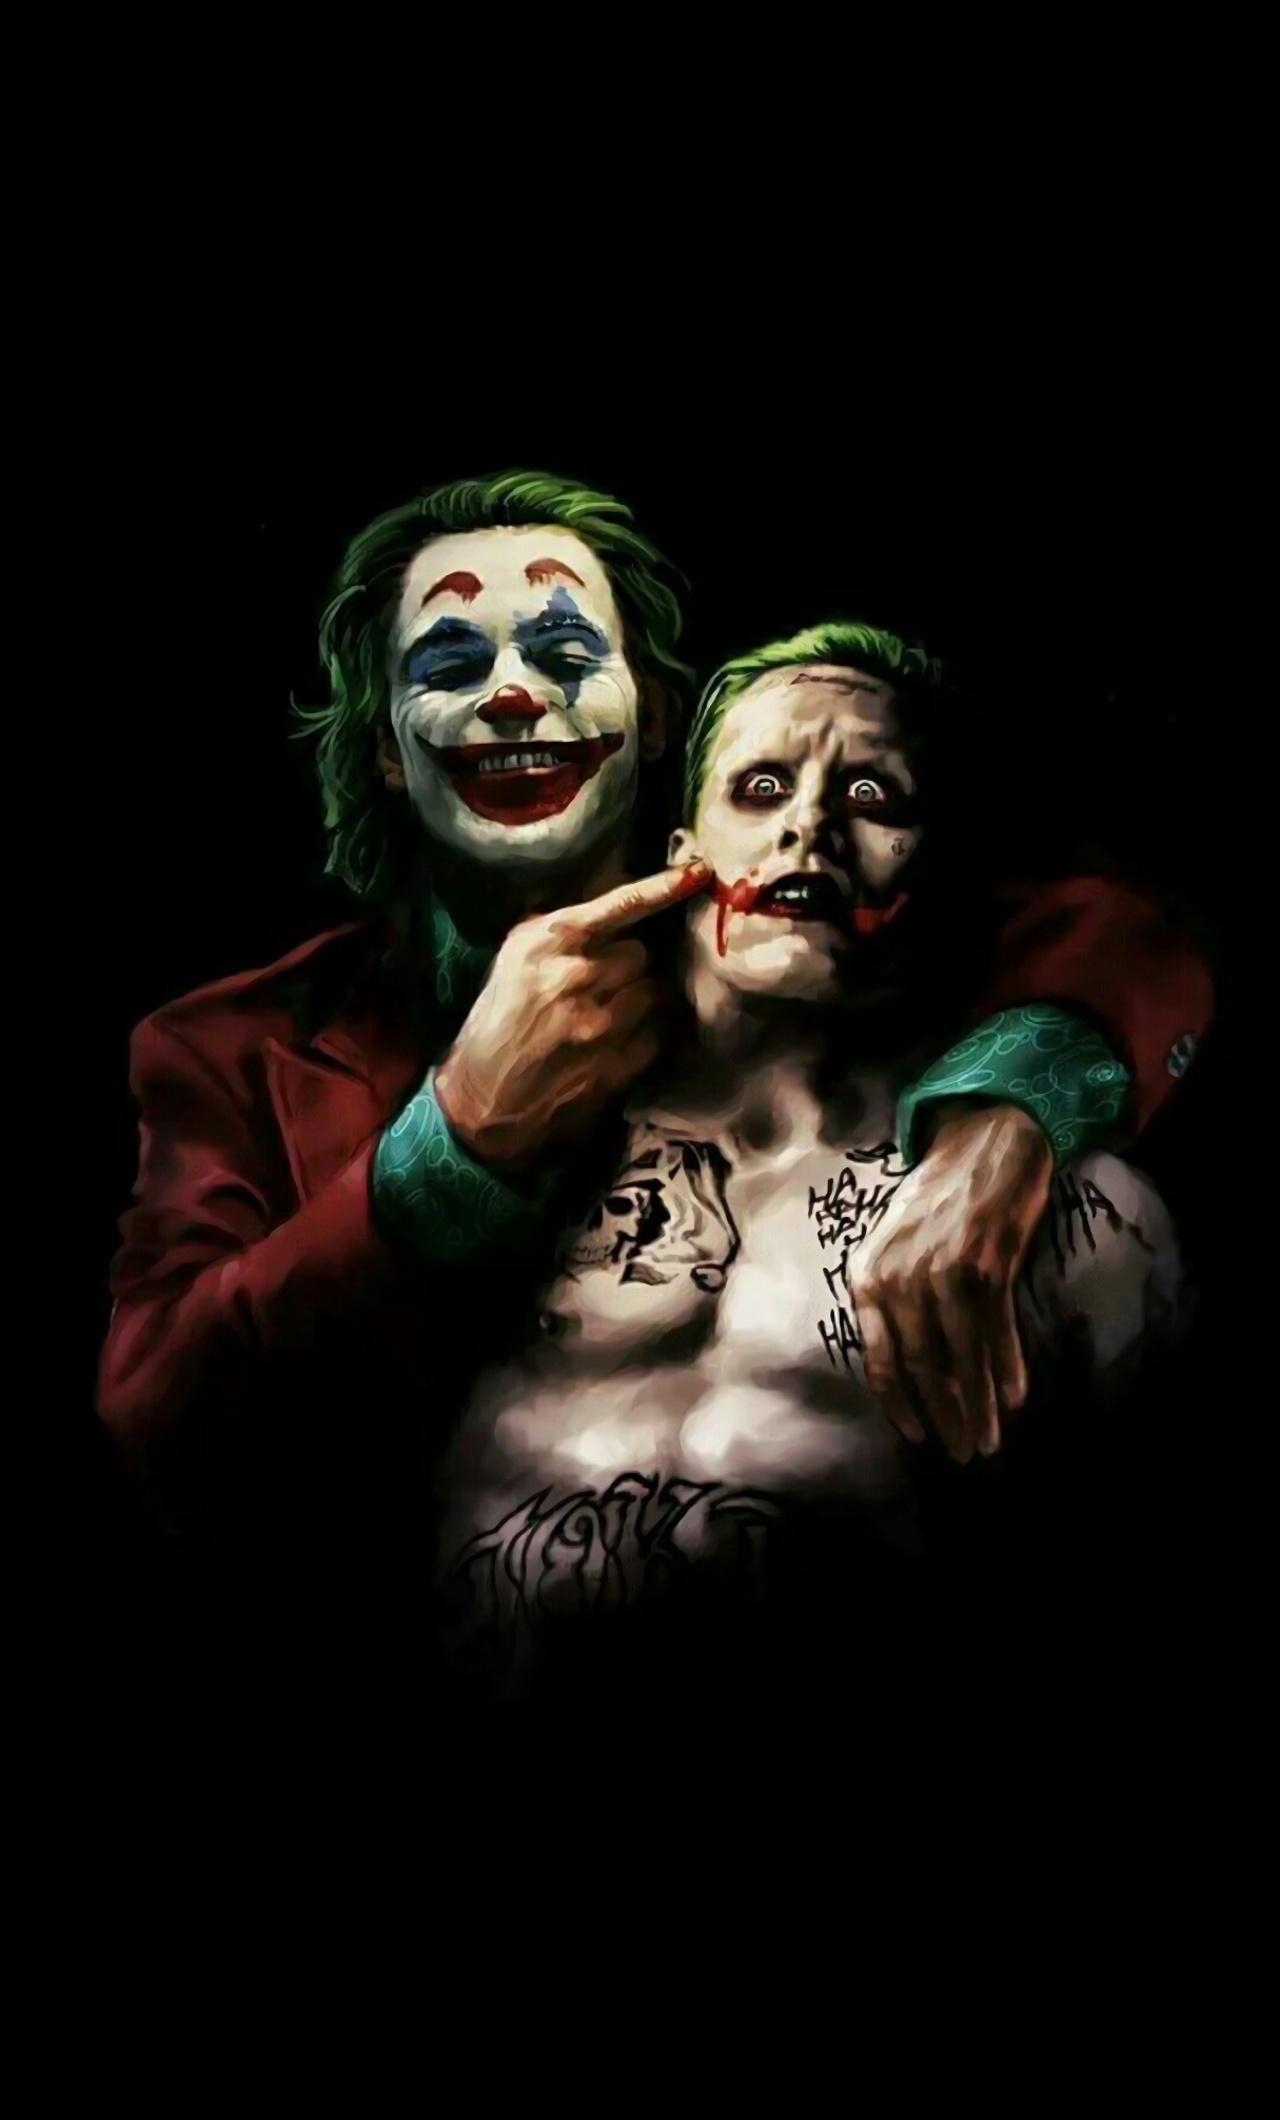 1280x2120 Joaquin Phoenix And Jared Leto As Joker 4k Iphone